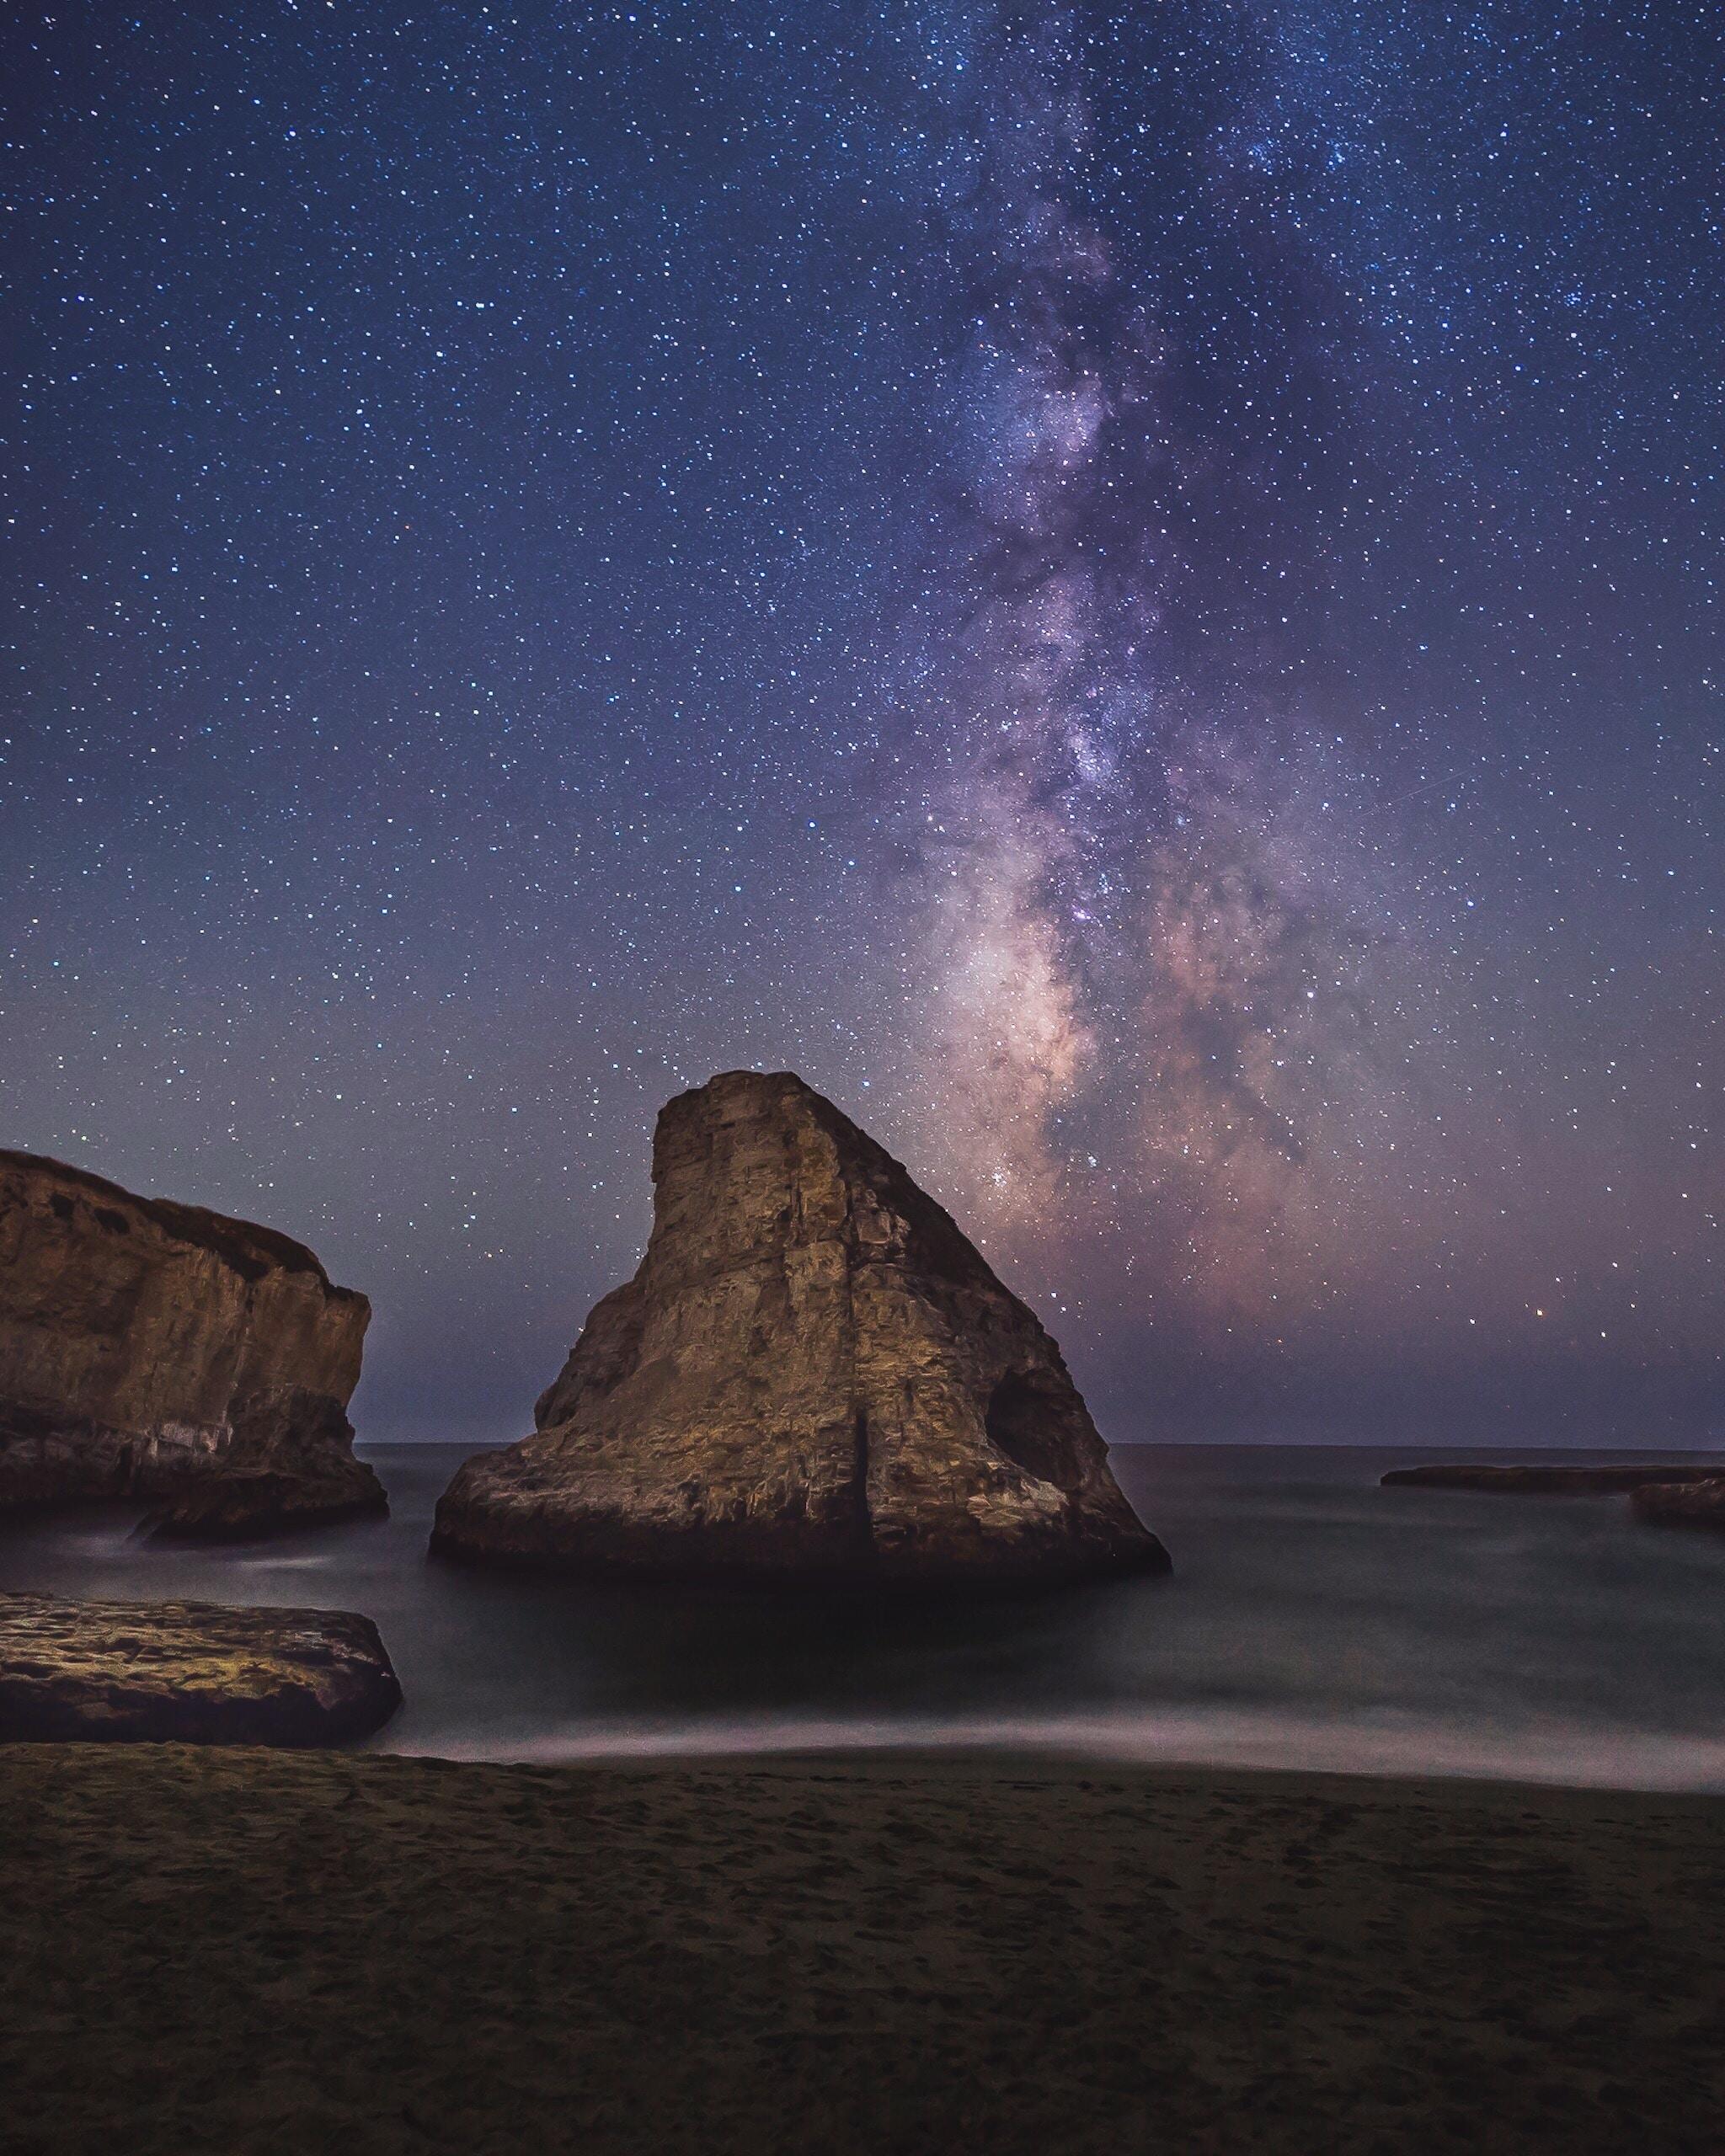 Galaxy photography